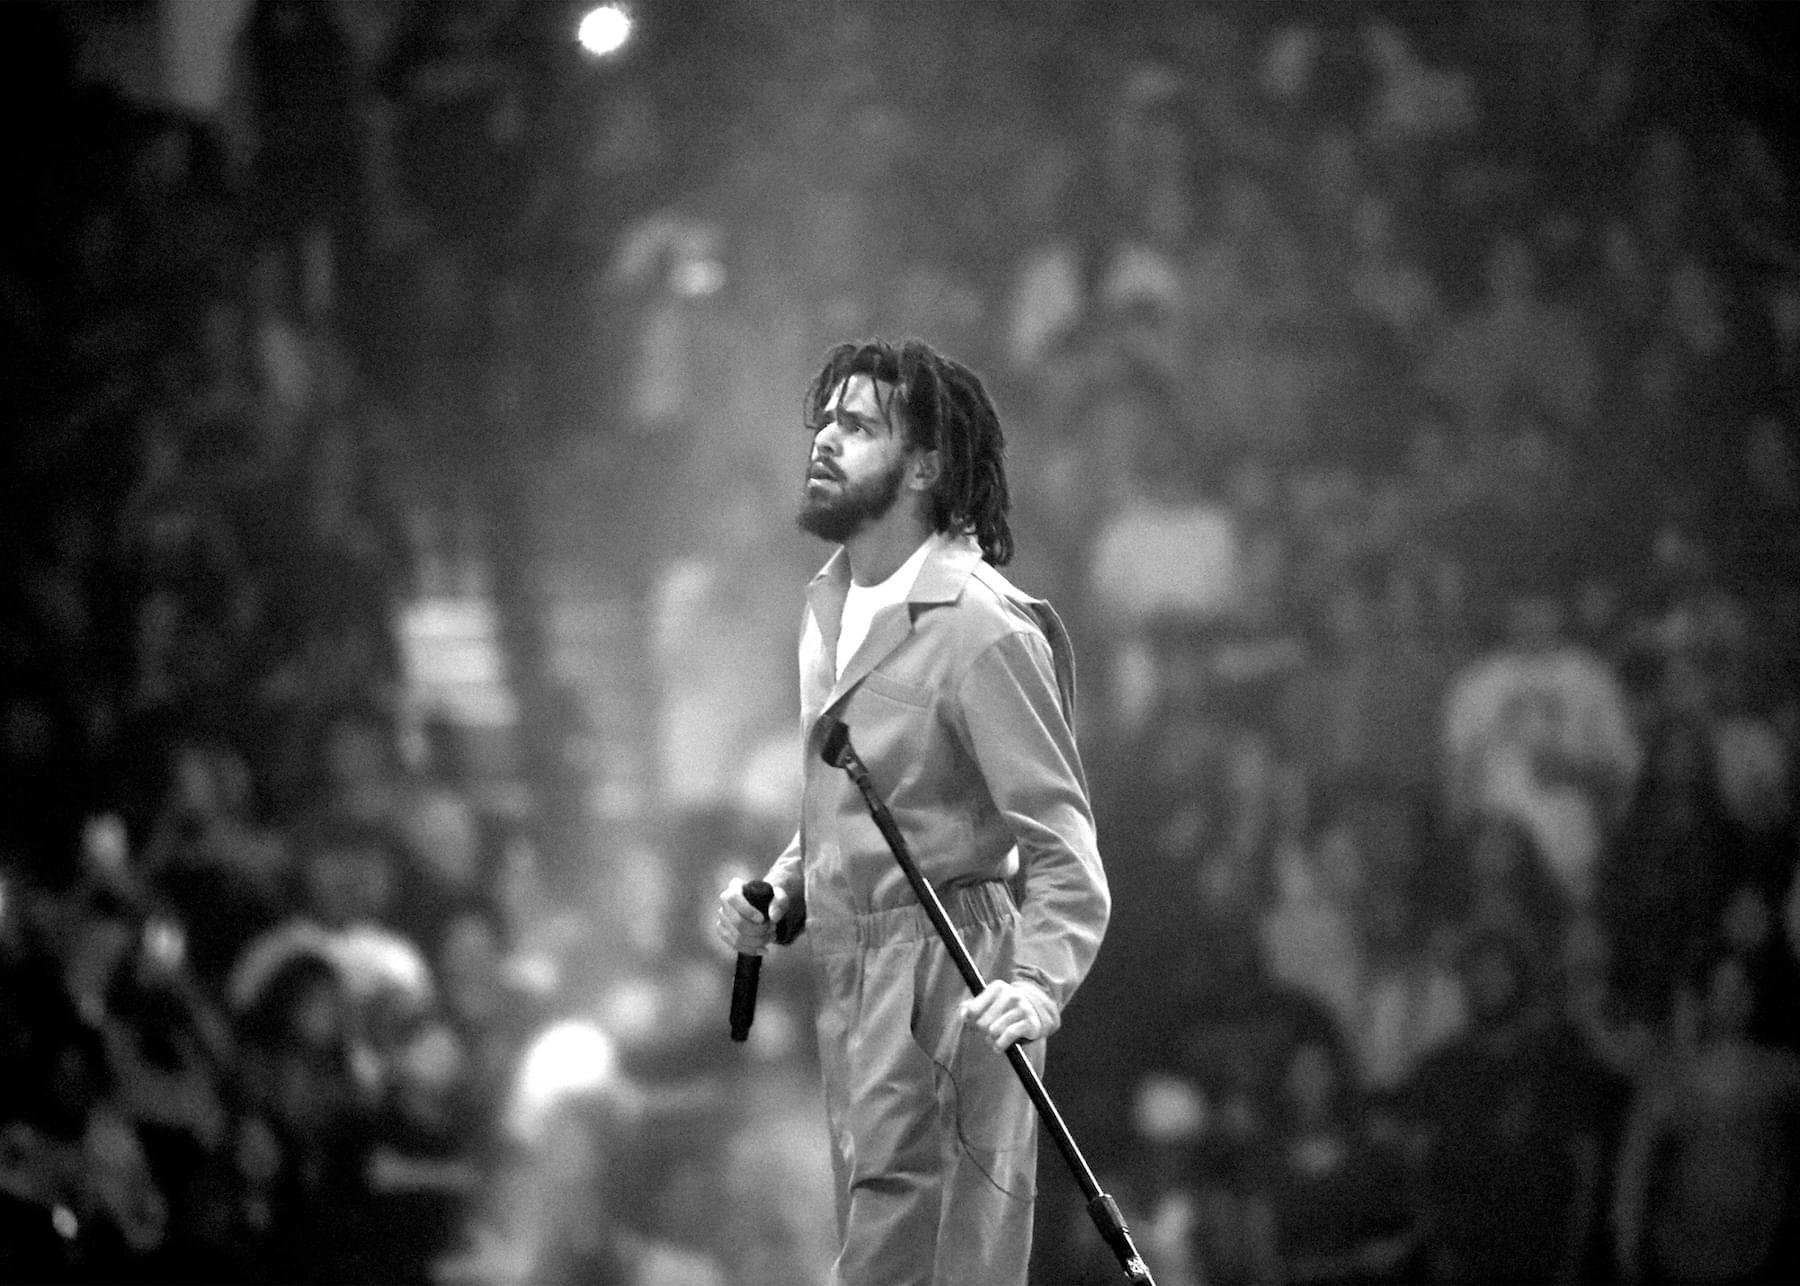 J. Cole's 'KOD' Claims #1 Spot On Billboard 200 Charts